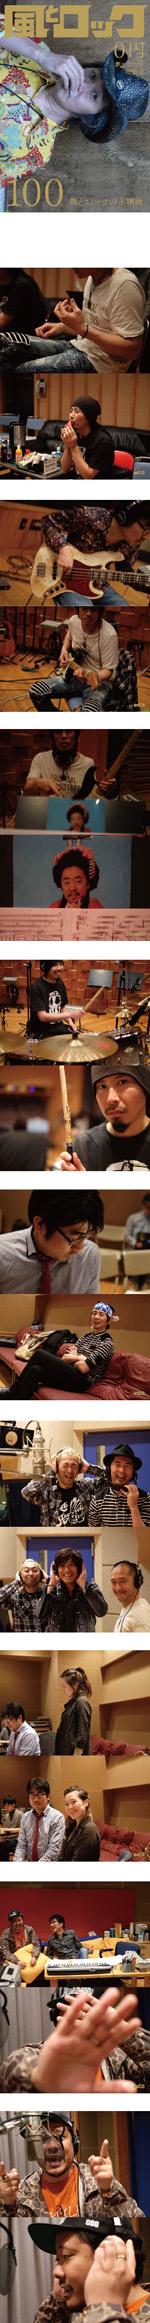 20140505_tokubetsu1s.jpg